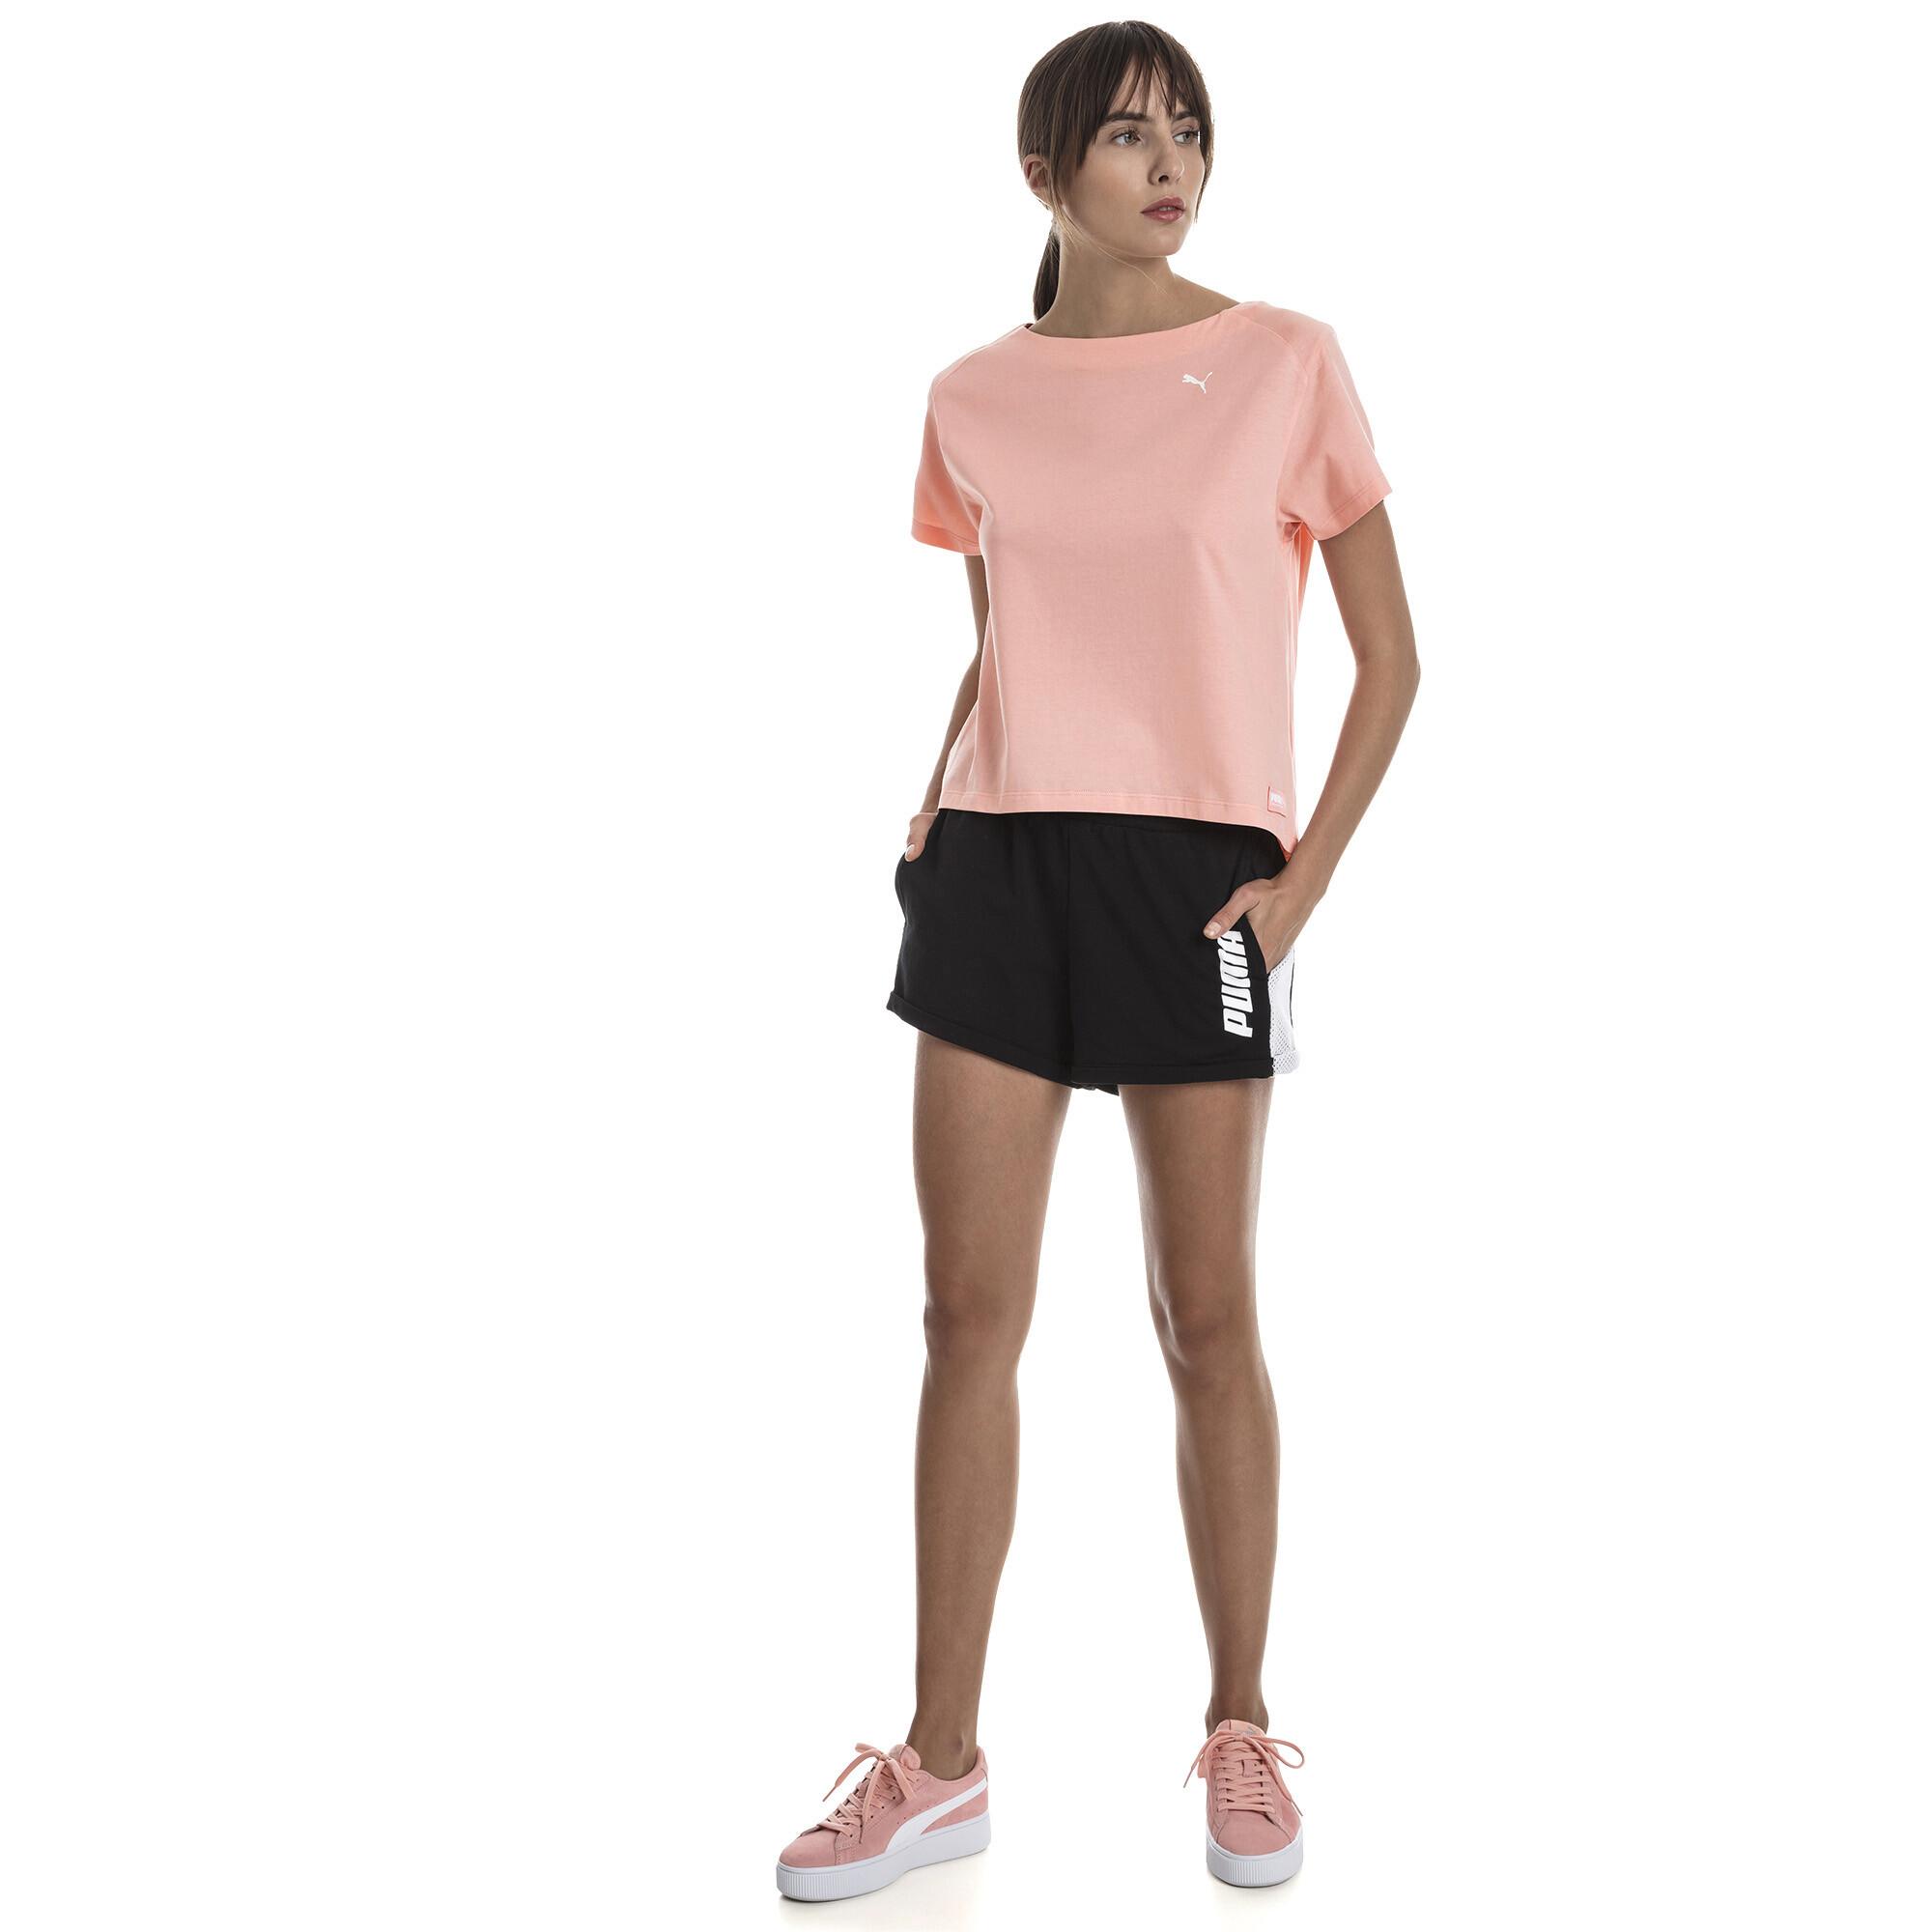 PUMA-Modern-Sports-Damen-Shorts-Frauen-Shorts-Basics-Neu Indexbild 6